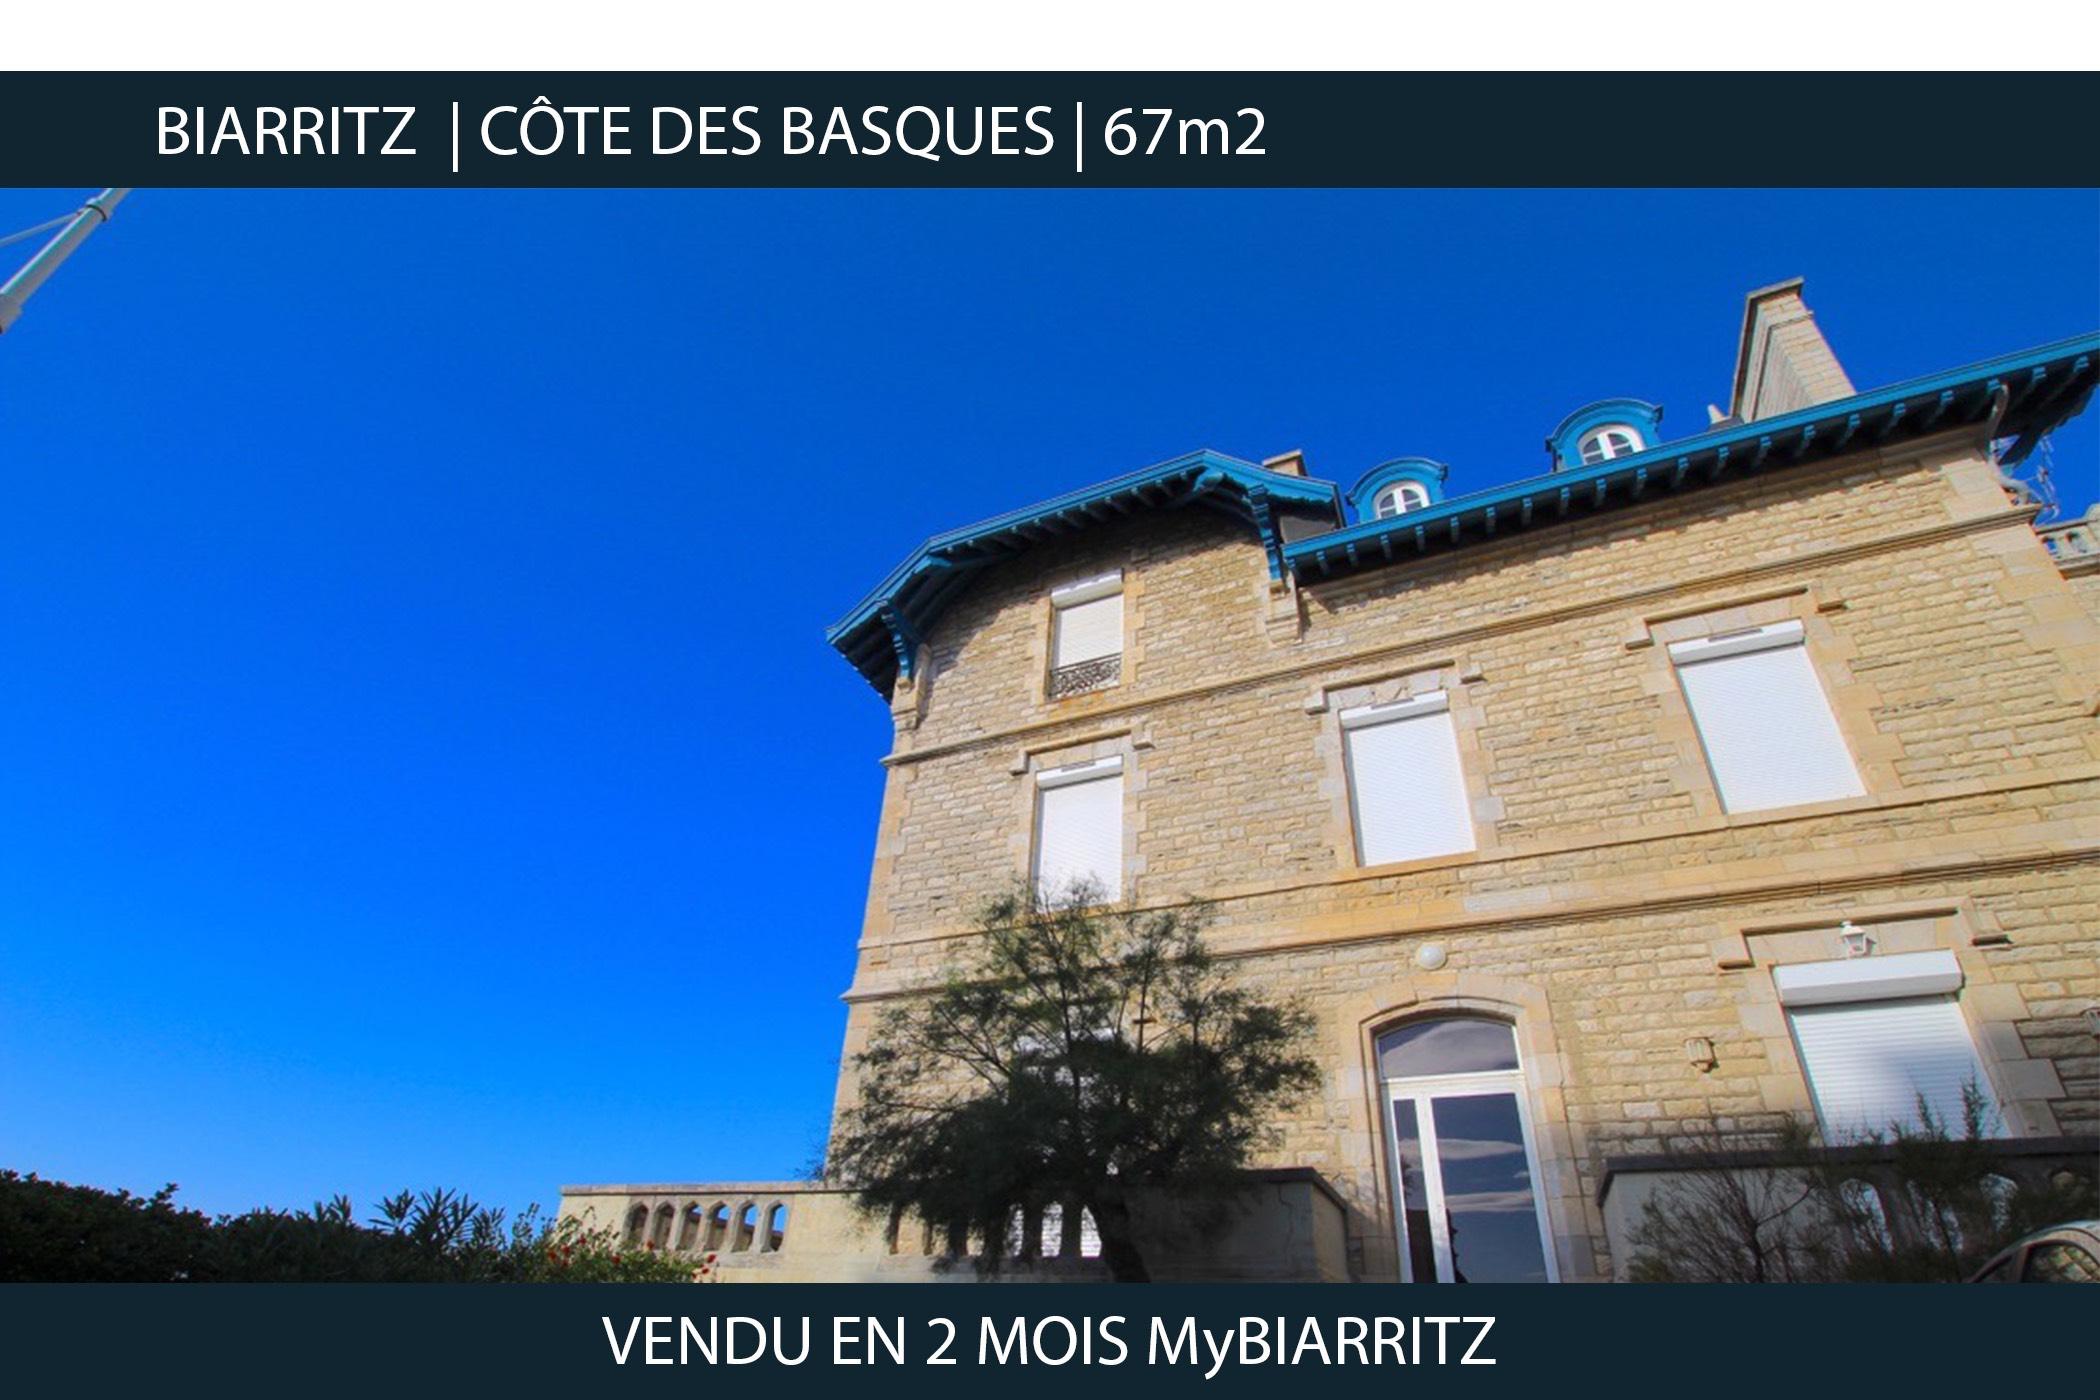 BIARRITZ-COTE_DES_BASQUES